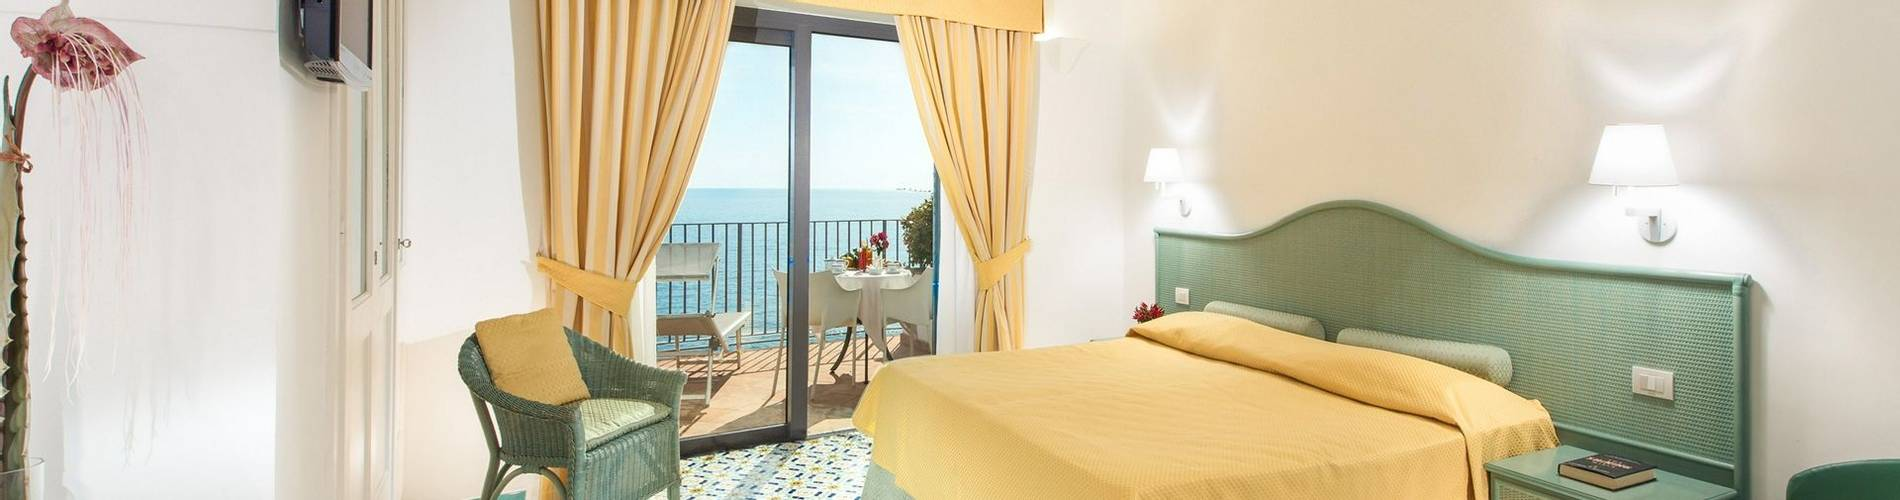 Miramalfi, Amalfi Coast, Italy, Superior (6).jpg